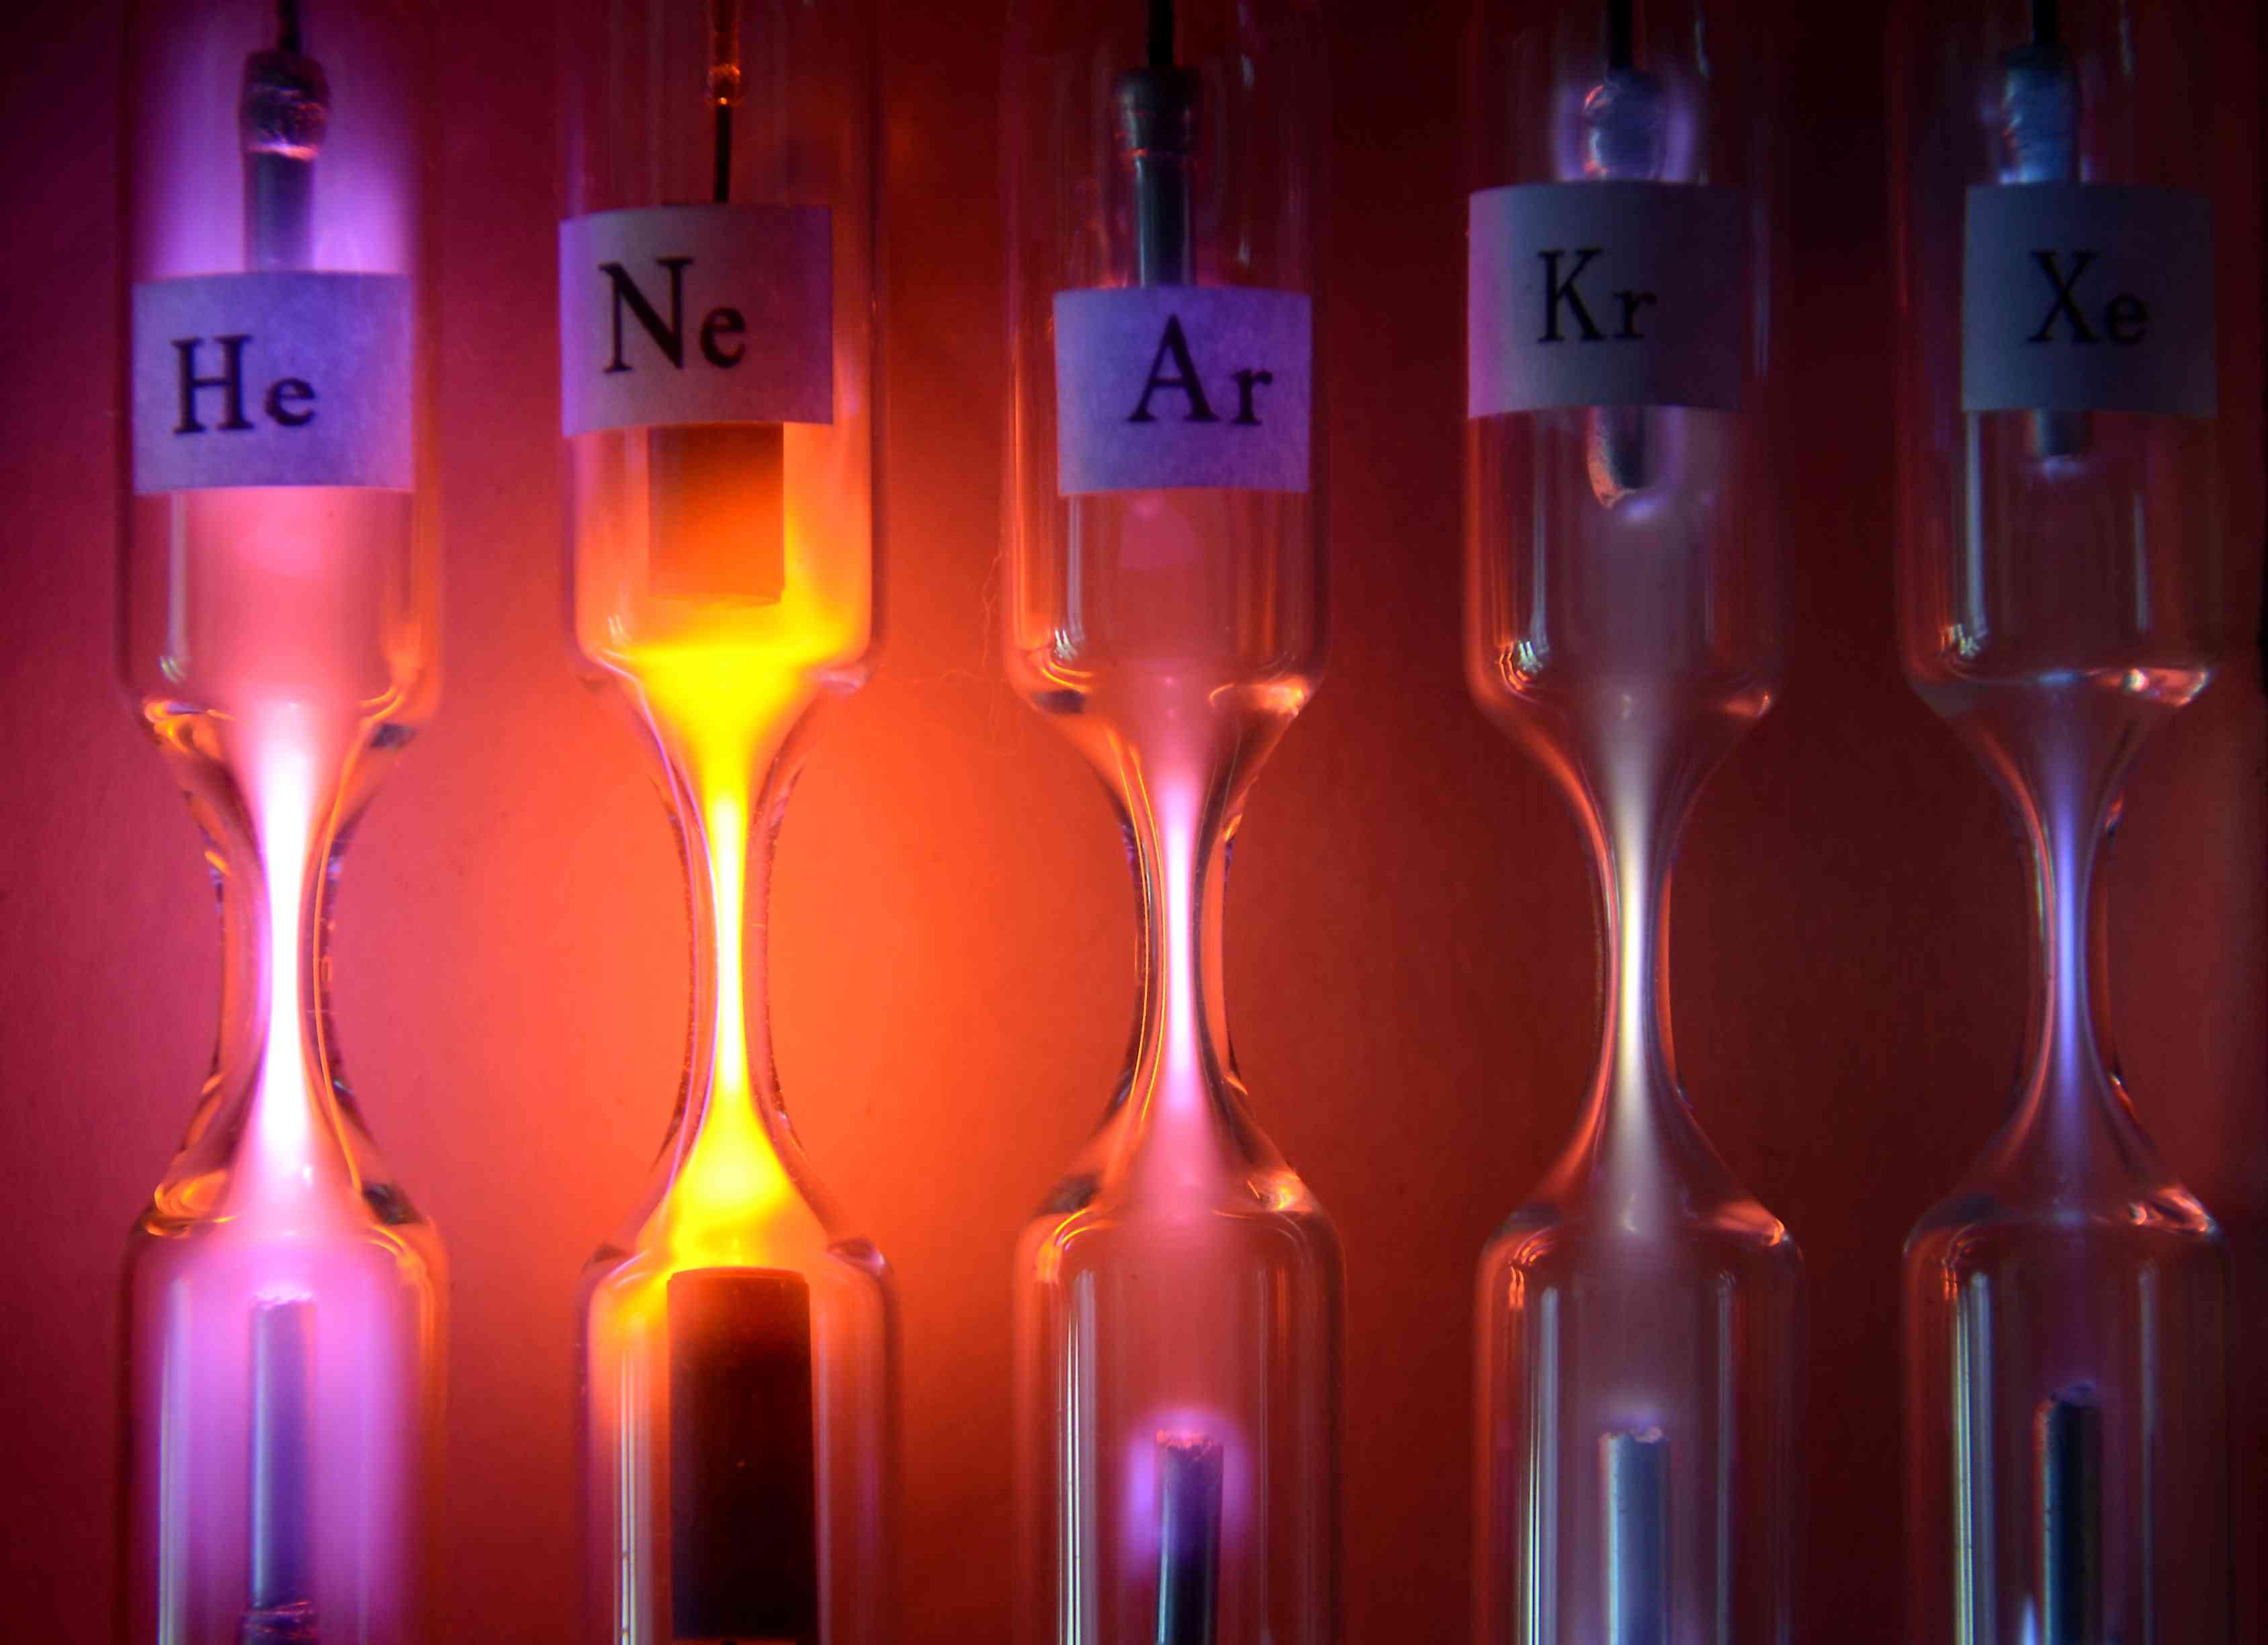 Ionized noble gases